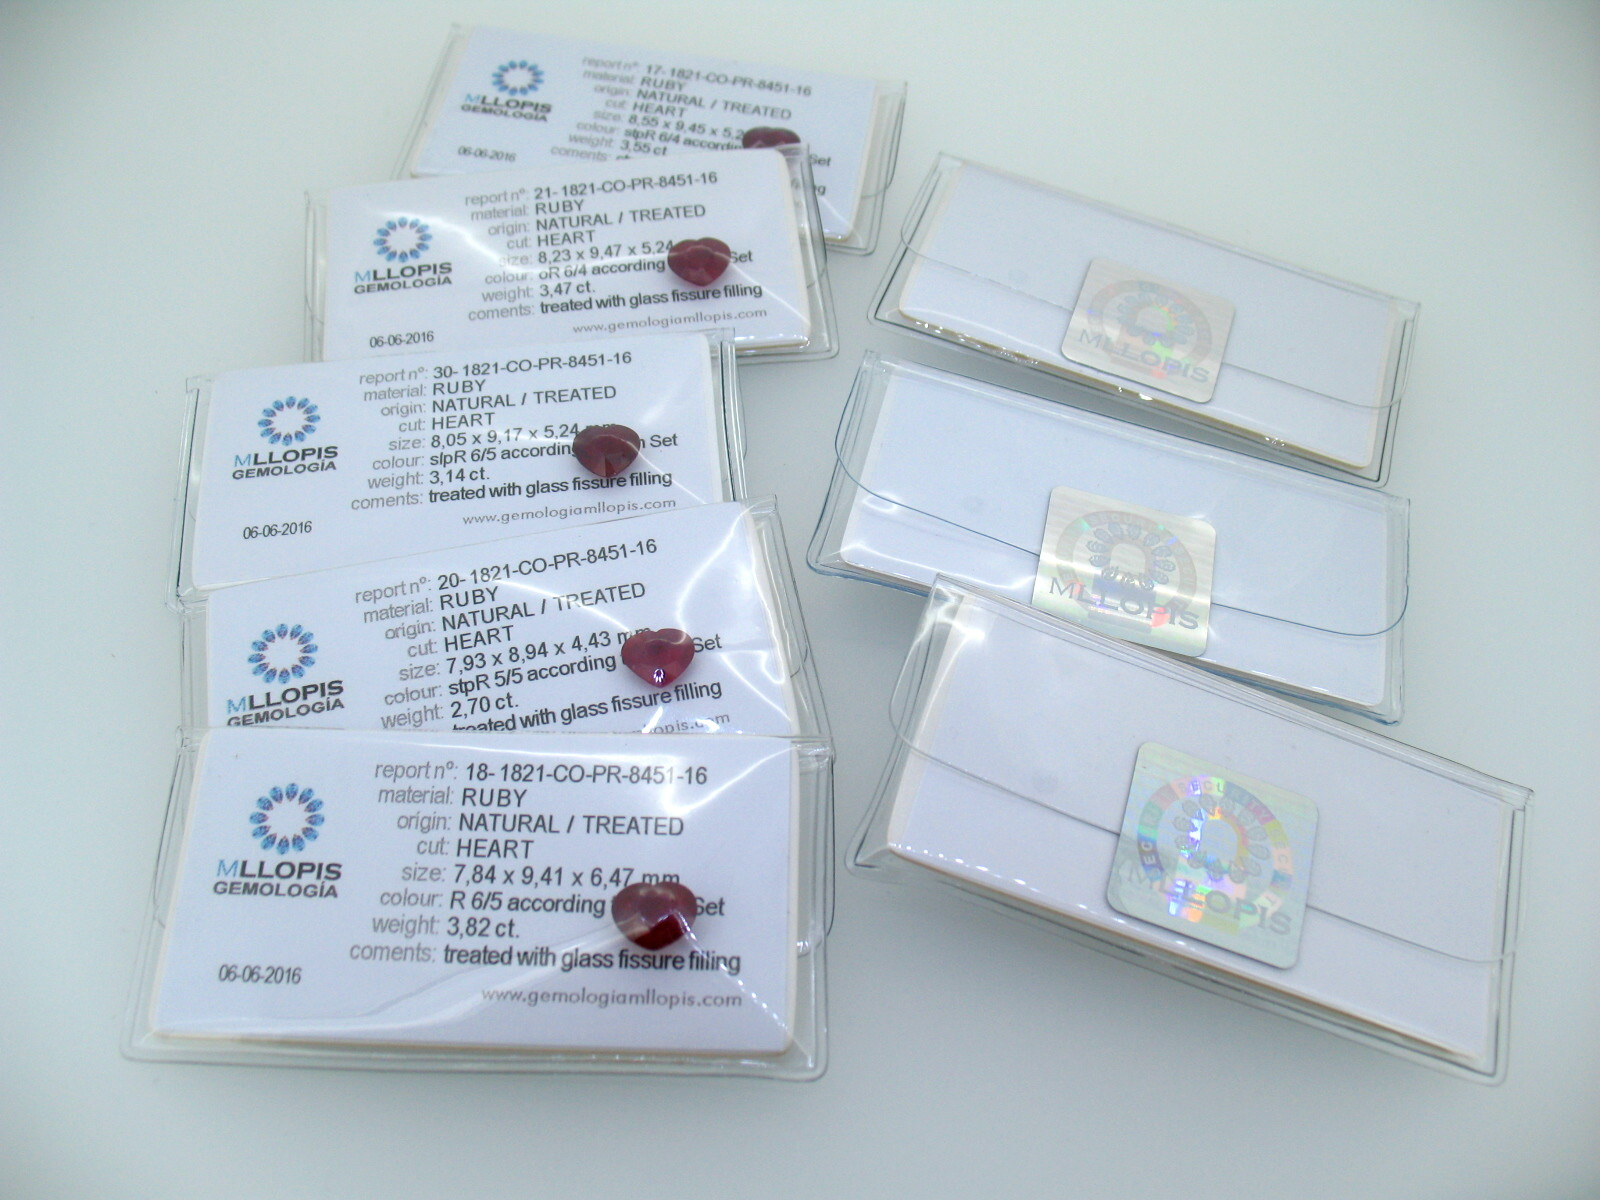 certificados-de-rubies-003